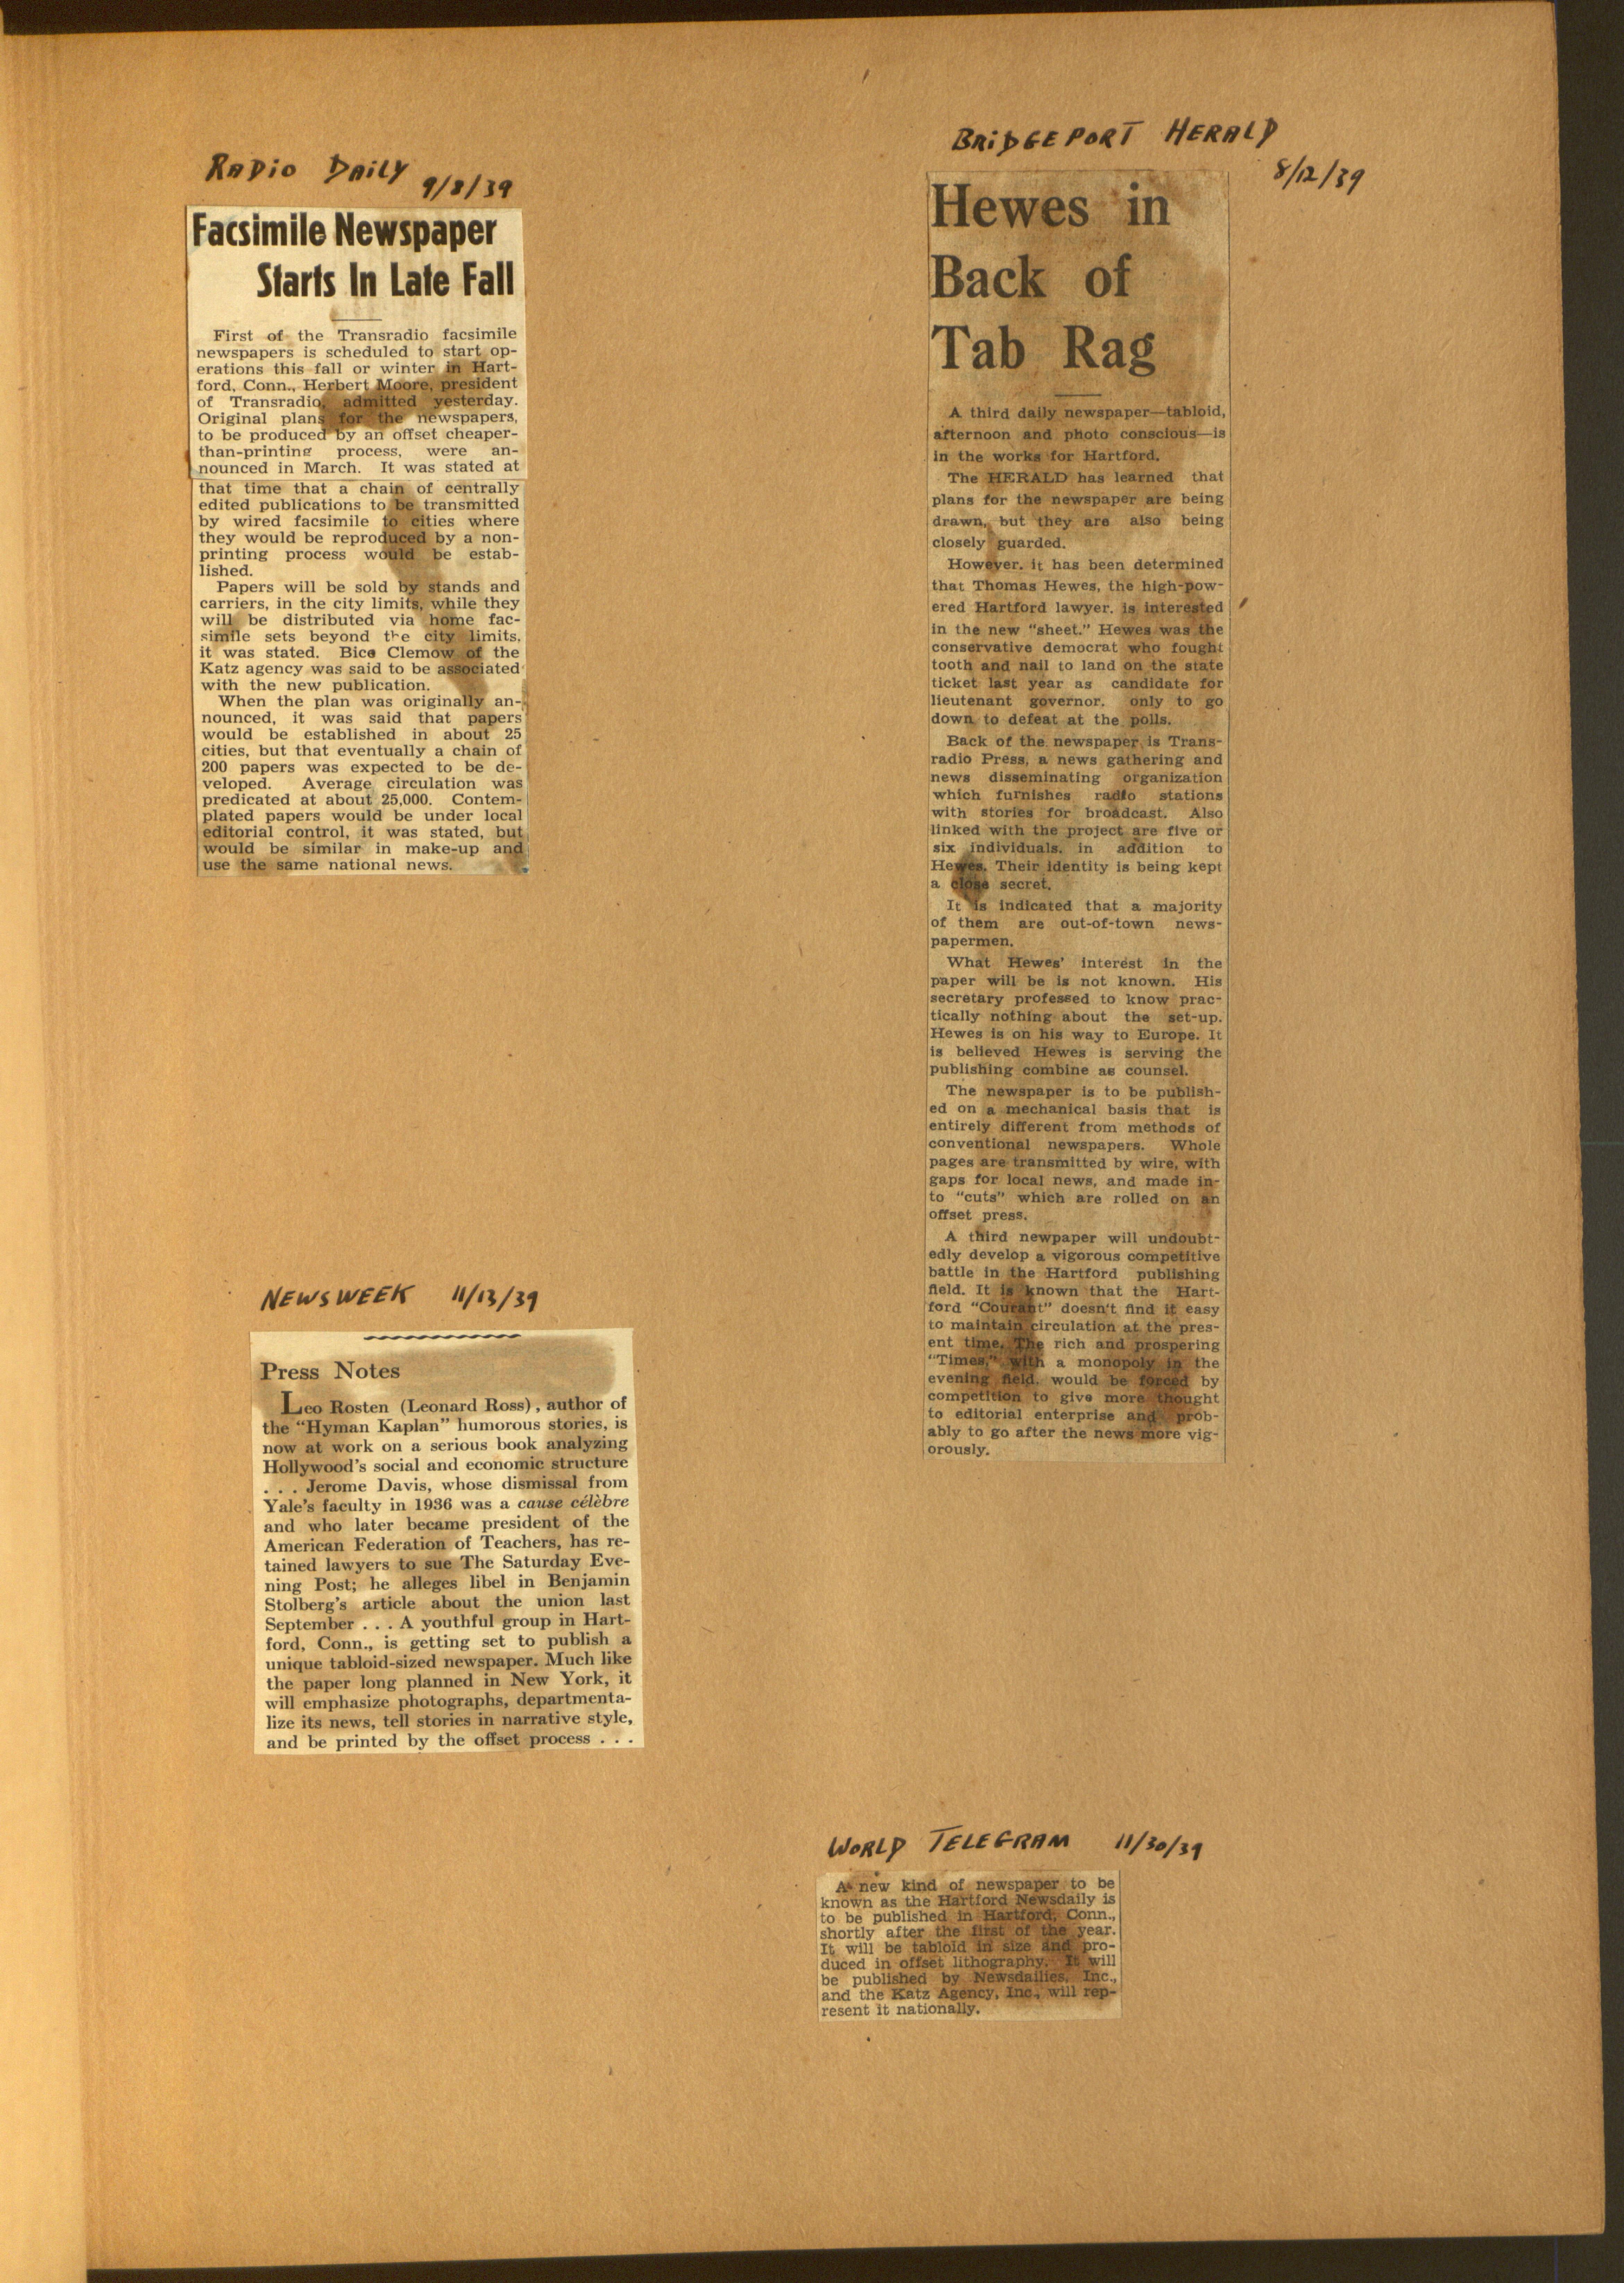 Hartford News Daily scrapbook, 1939-1940